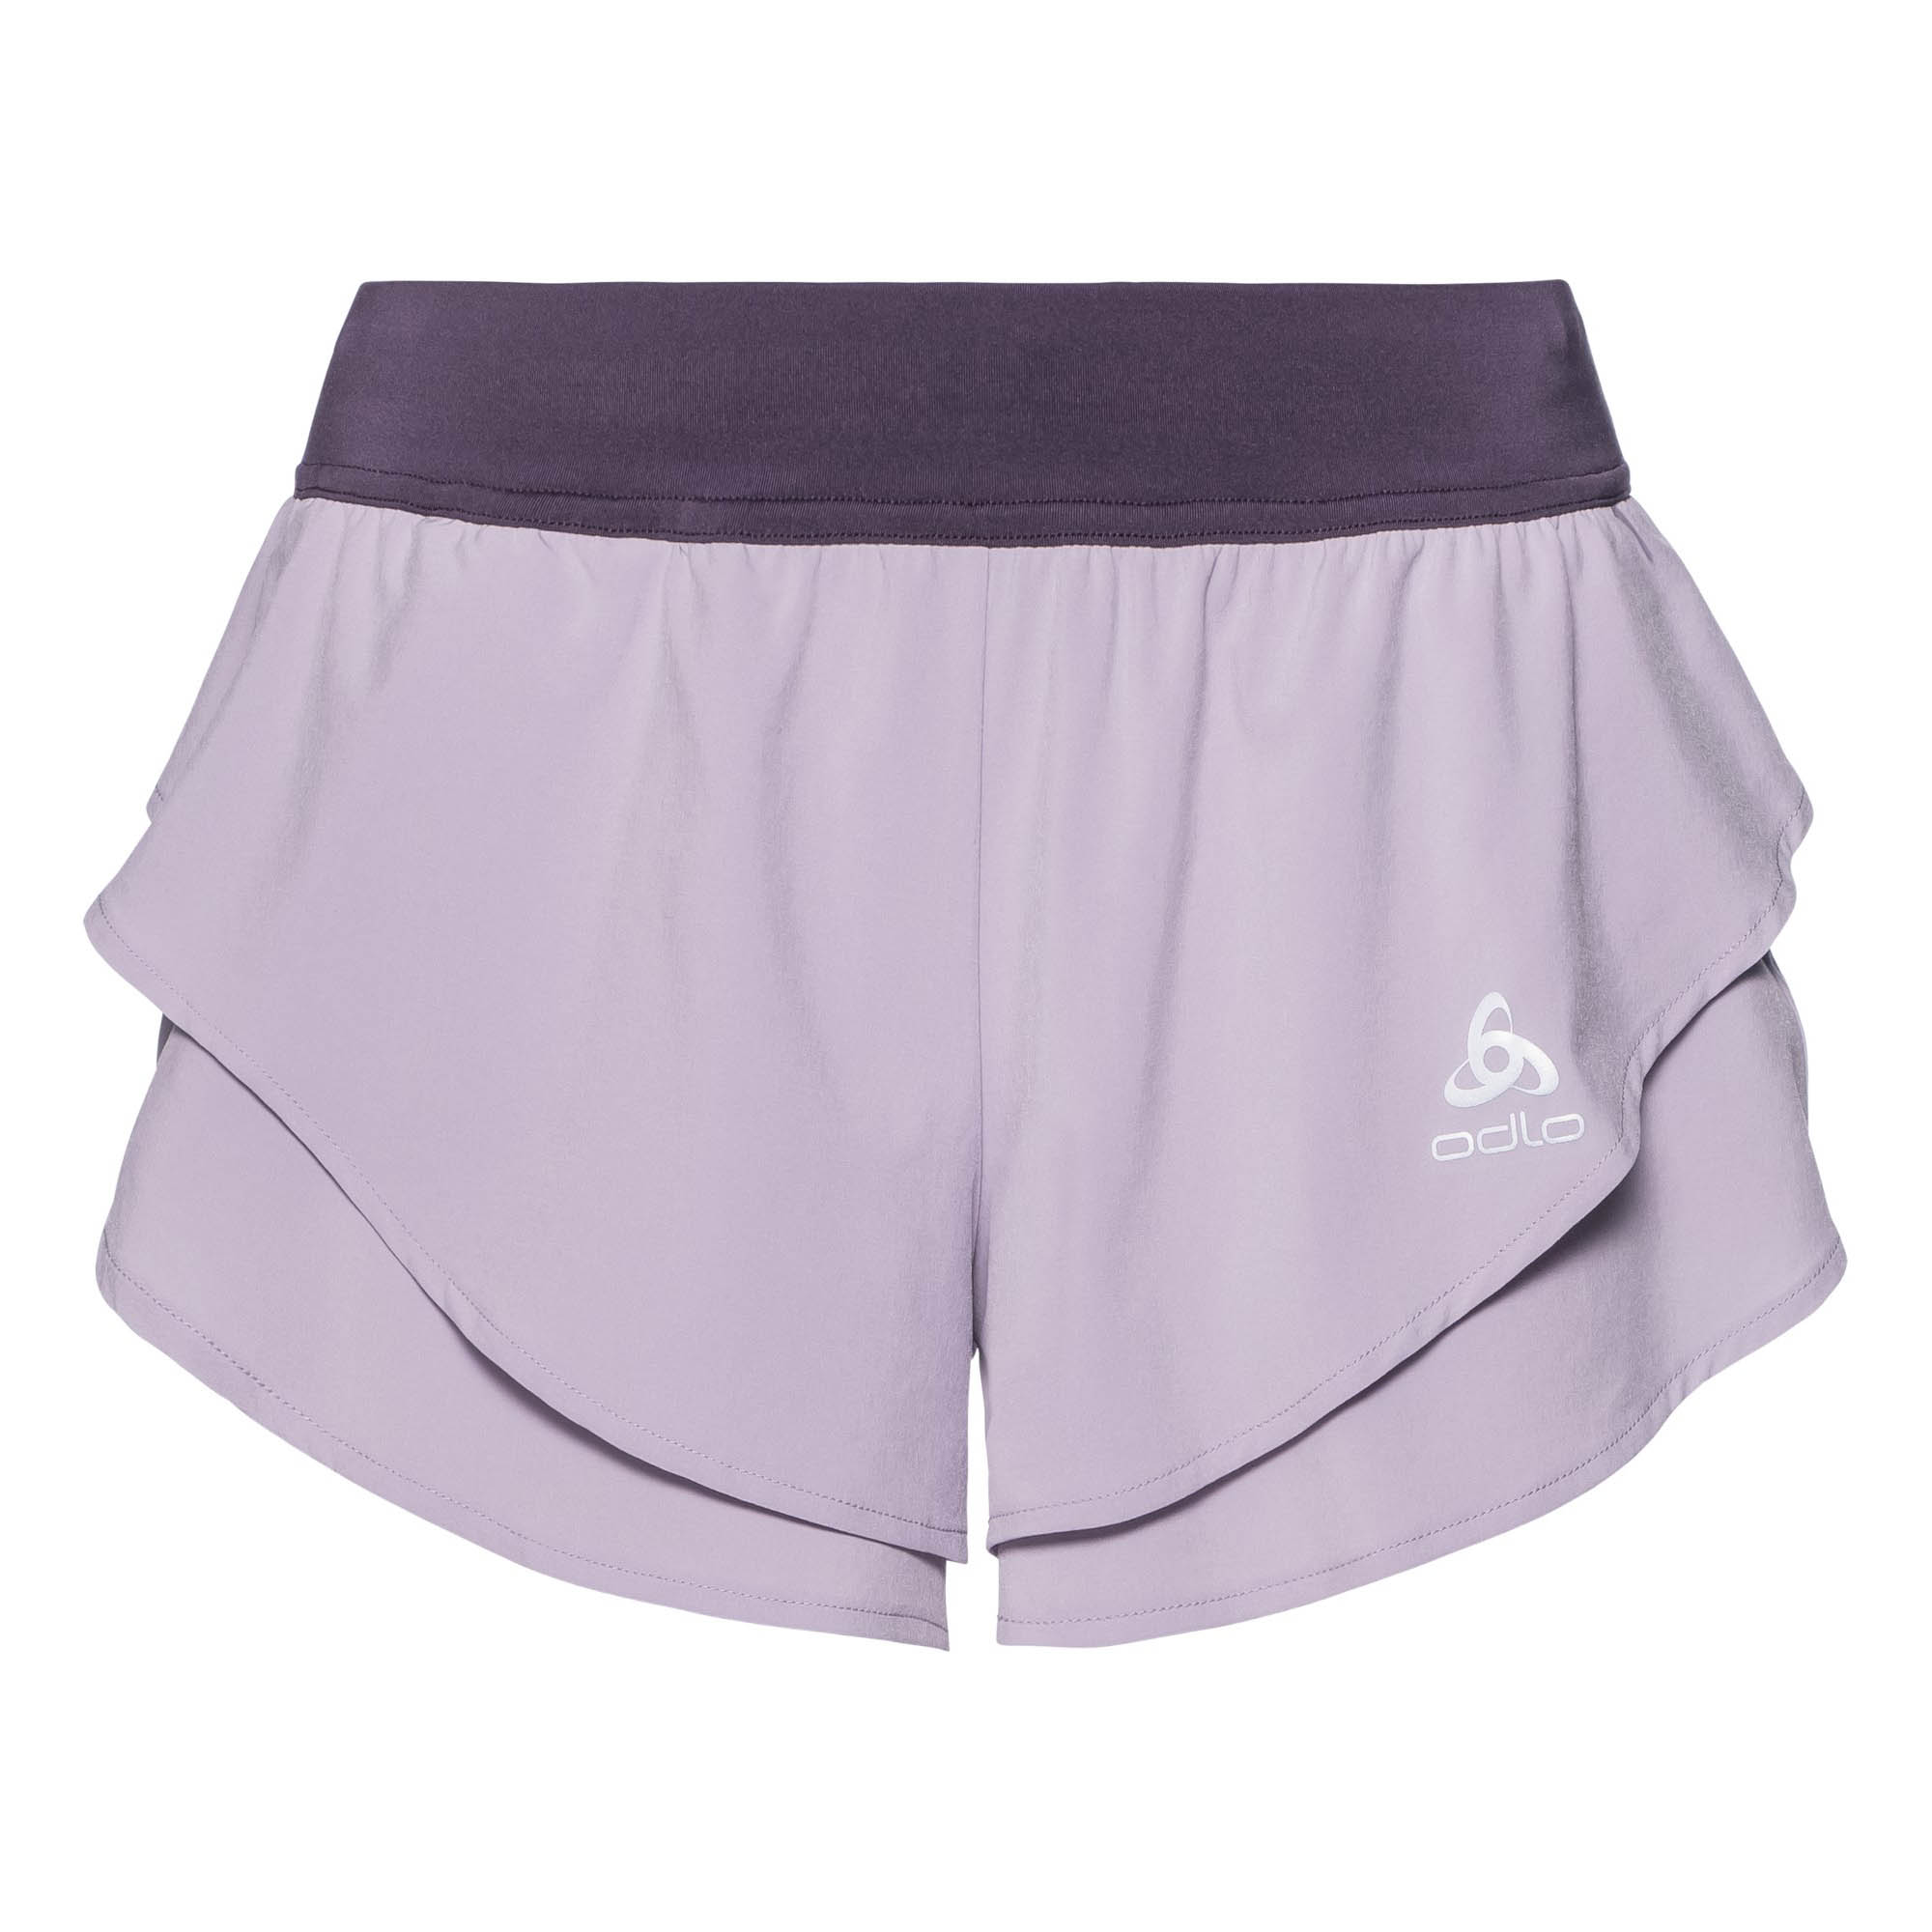 Odlo Damen Laufshort Split Shorts Omnius Light 321901-30464 S